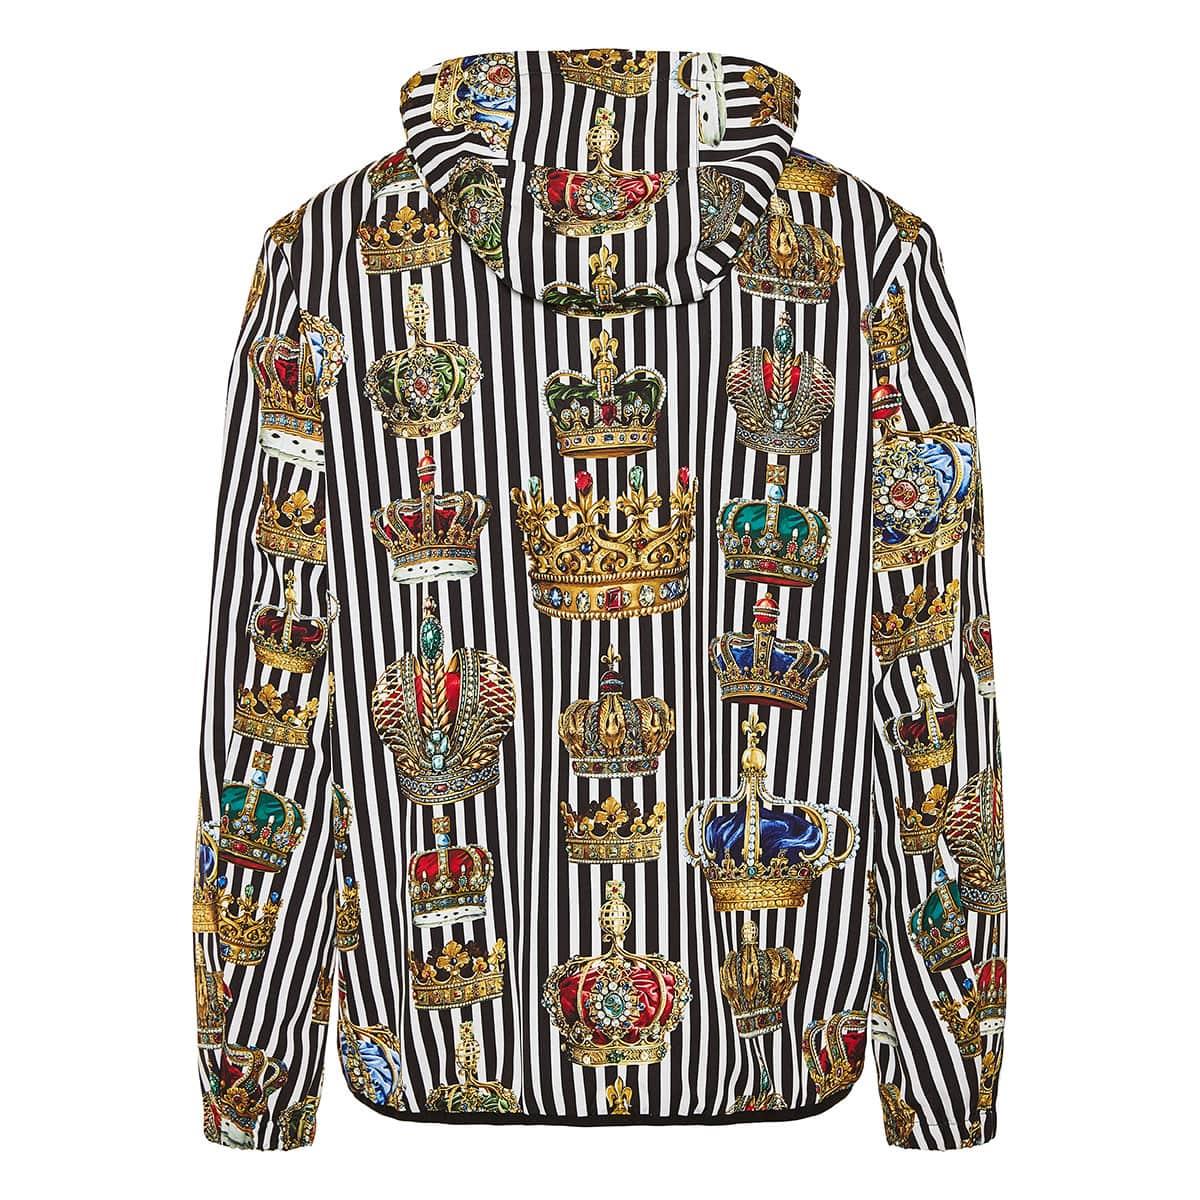 Crown printed striped nylon jacket